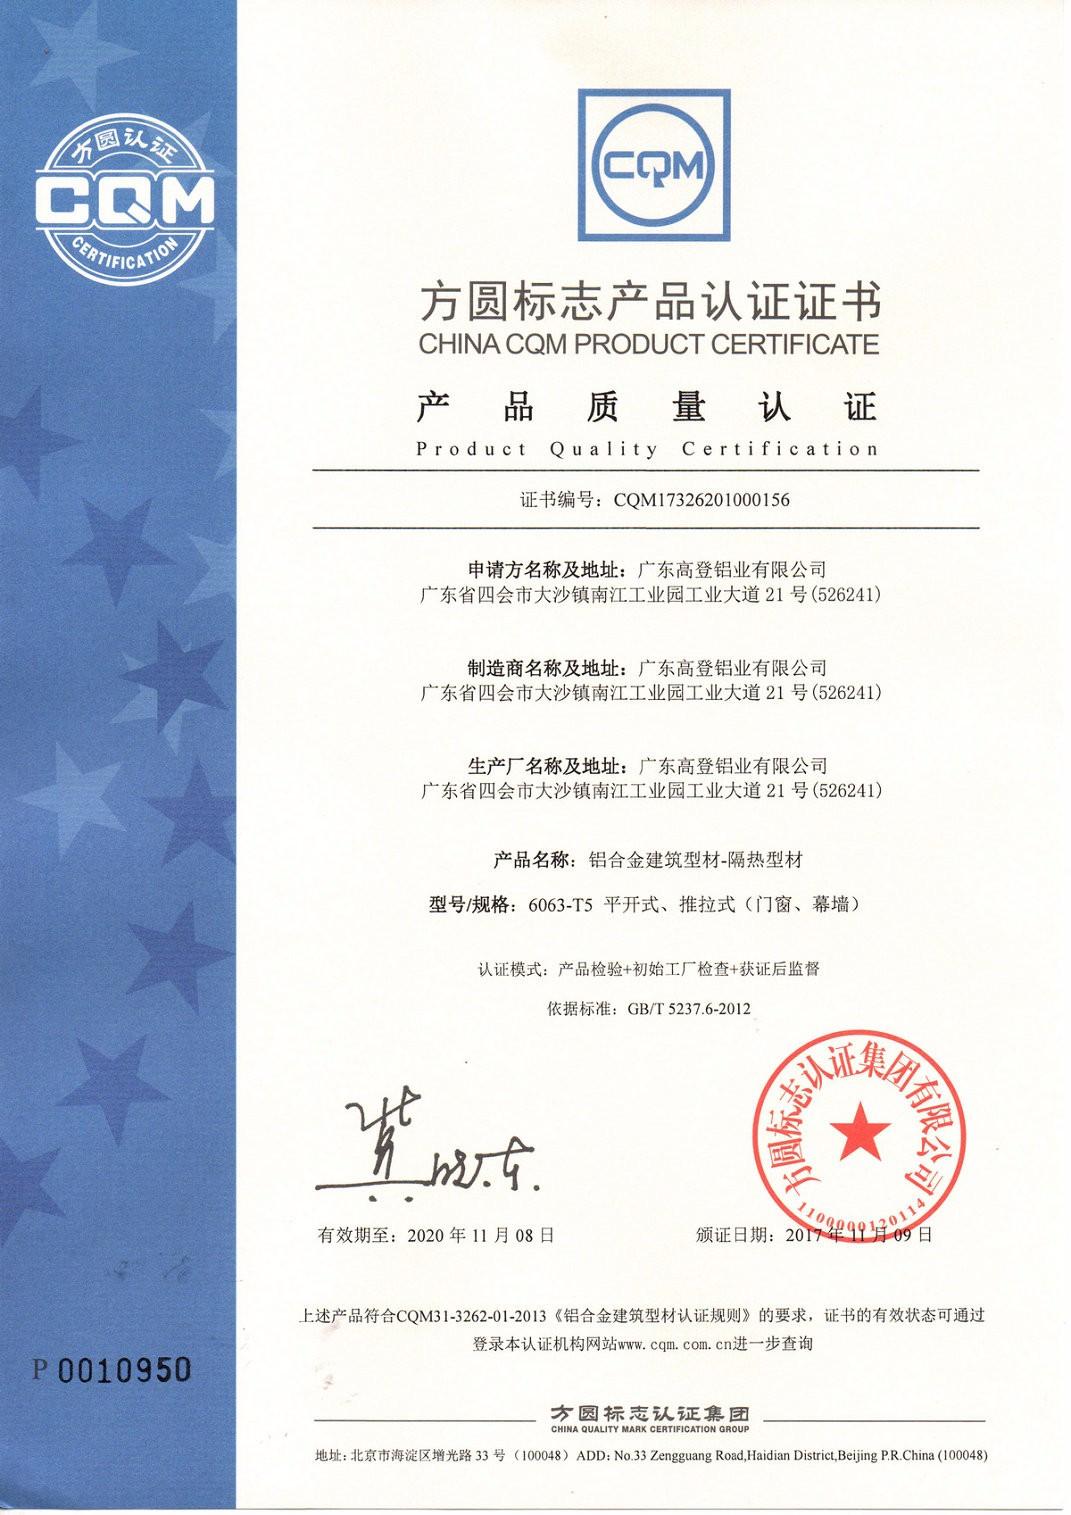 Guangdong golden aluminum group certificate of fangyuan mark certification xflitez Choice Image